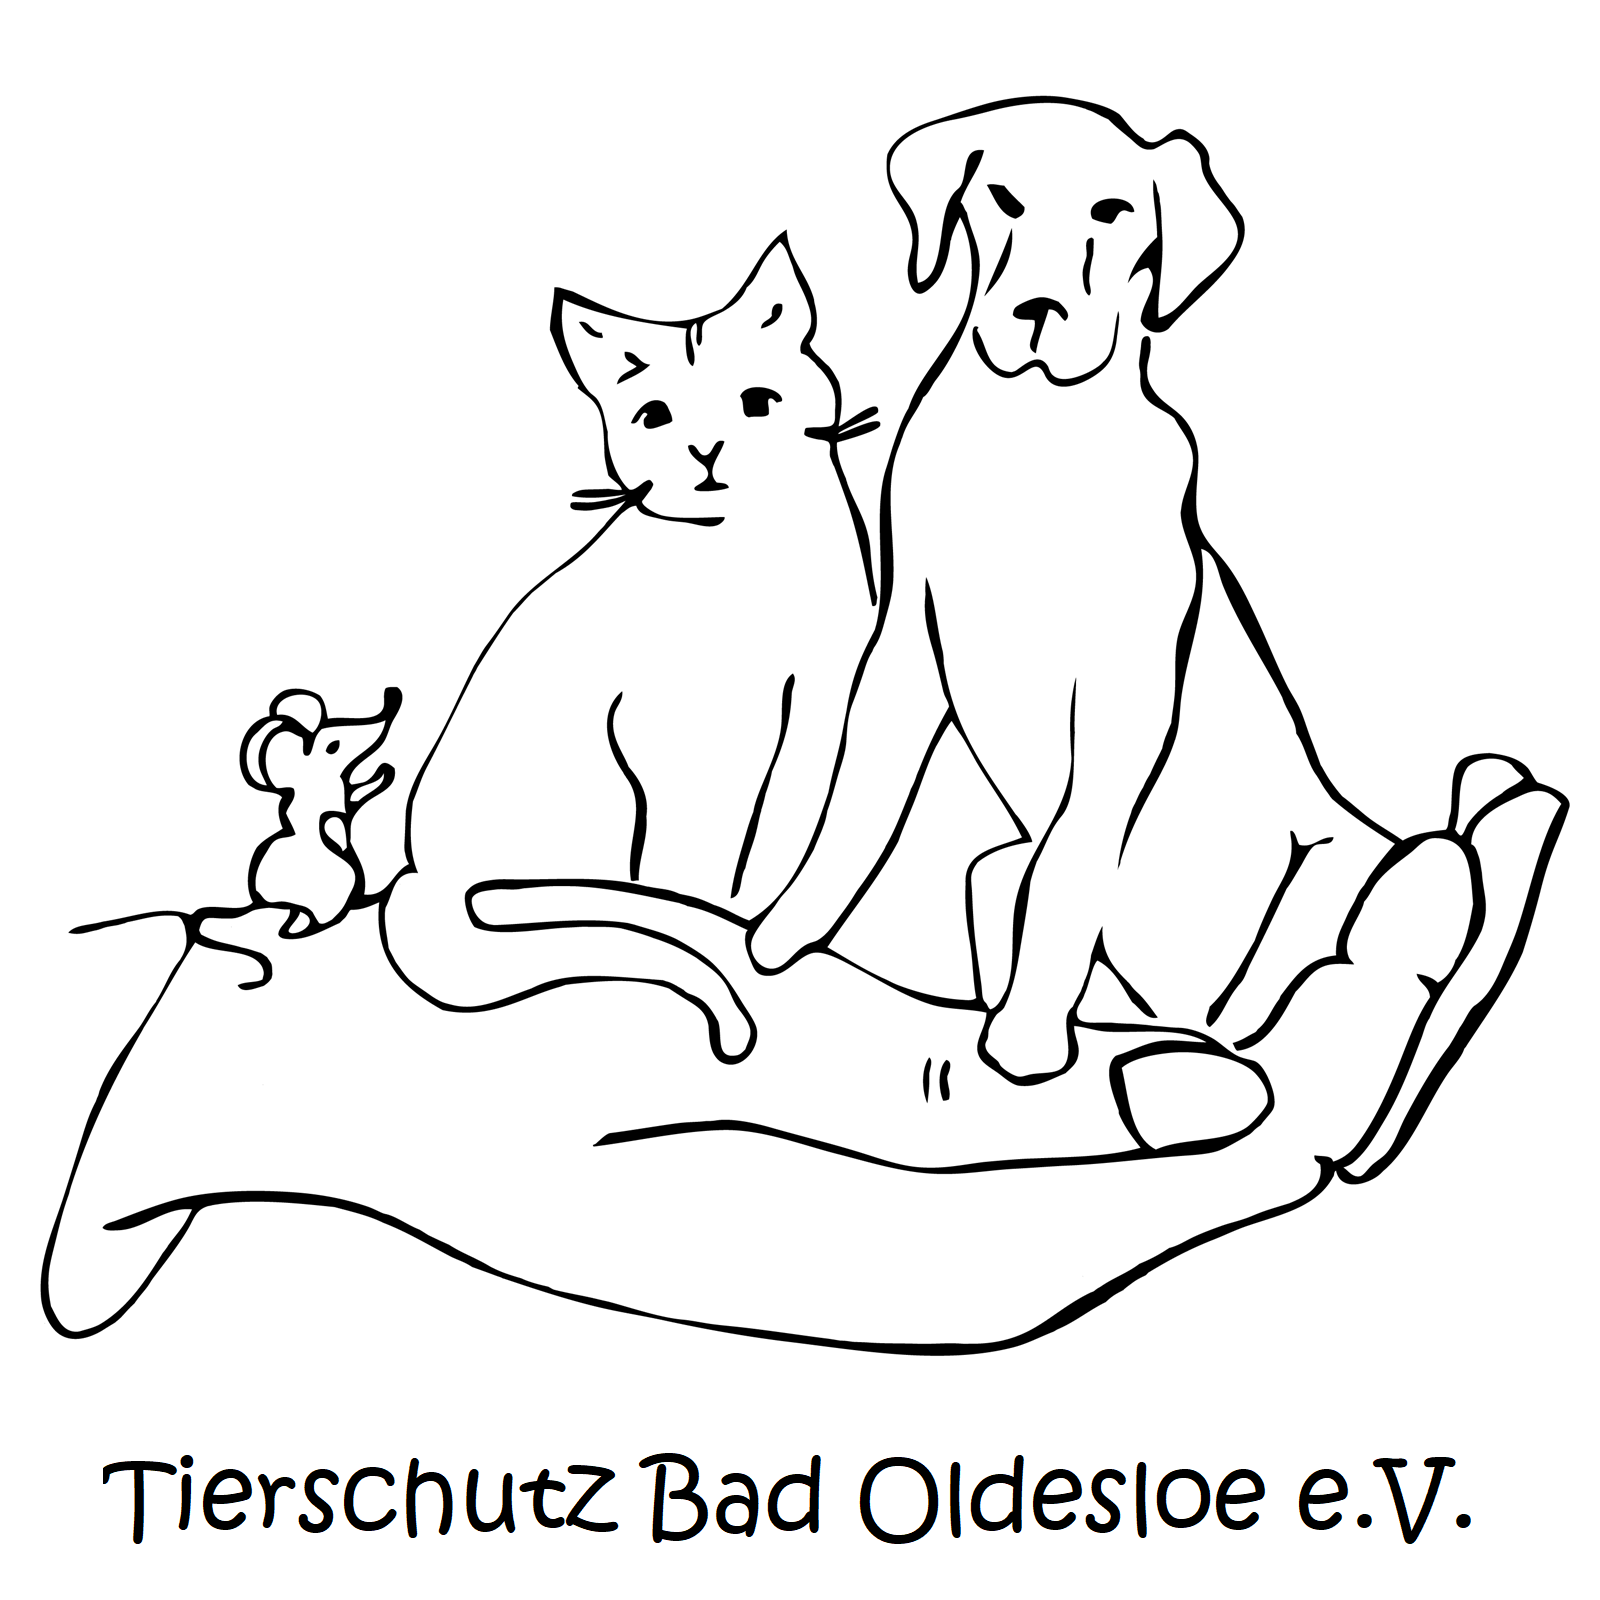 Tierschutz Bad Oldesloe und Umgebung e.V.